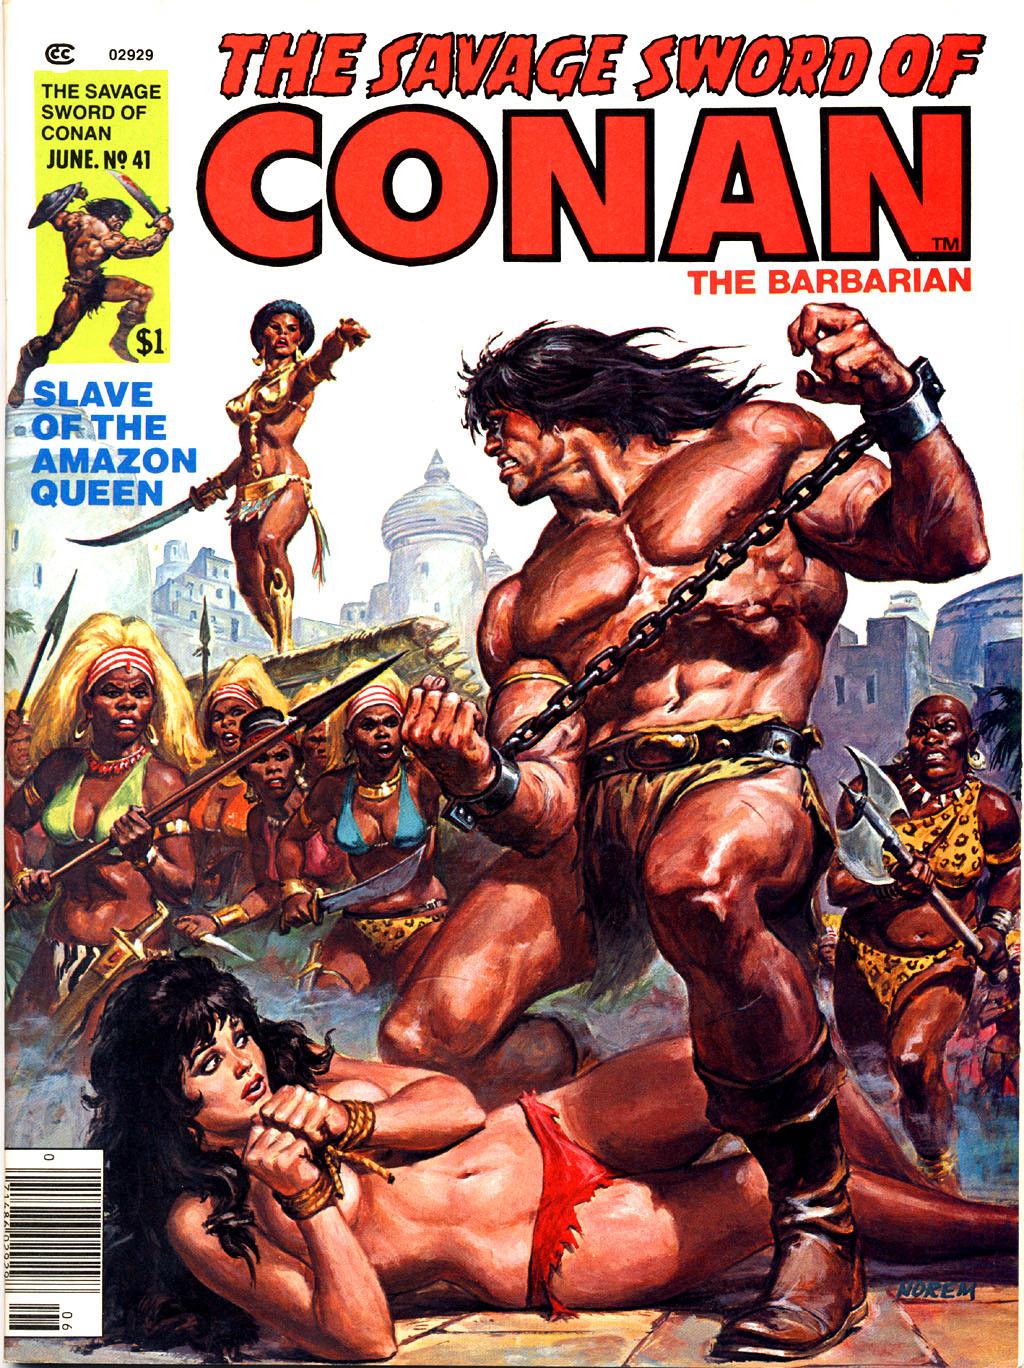 The Savage Sword of Conan #41.jpg